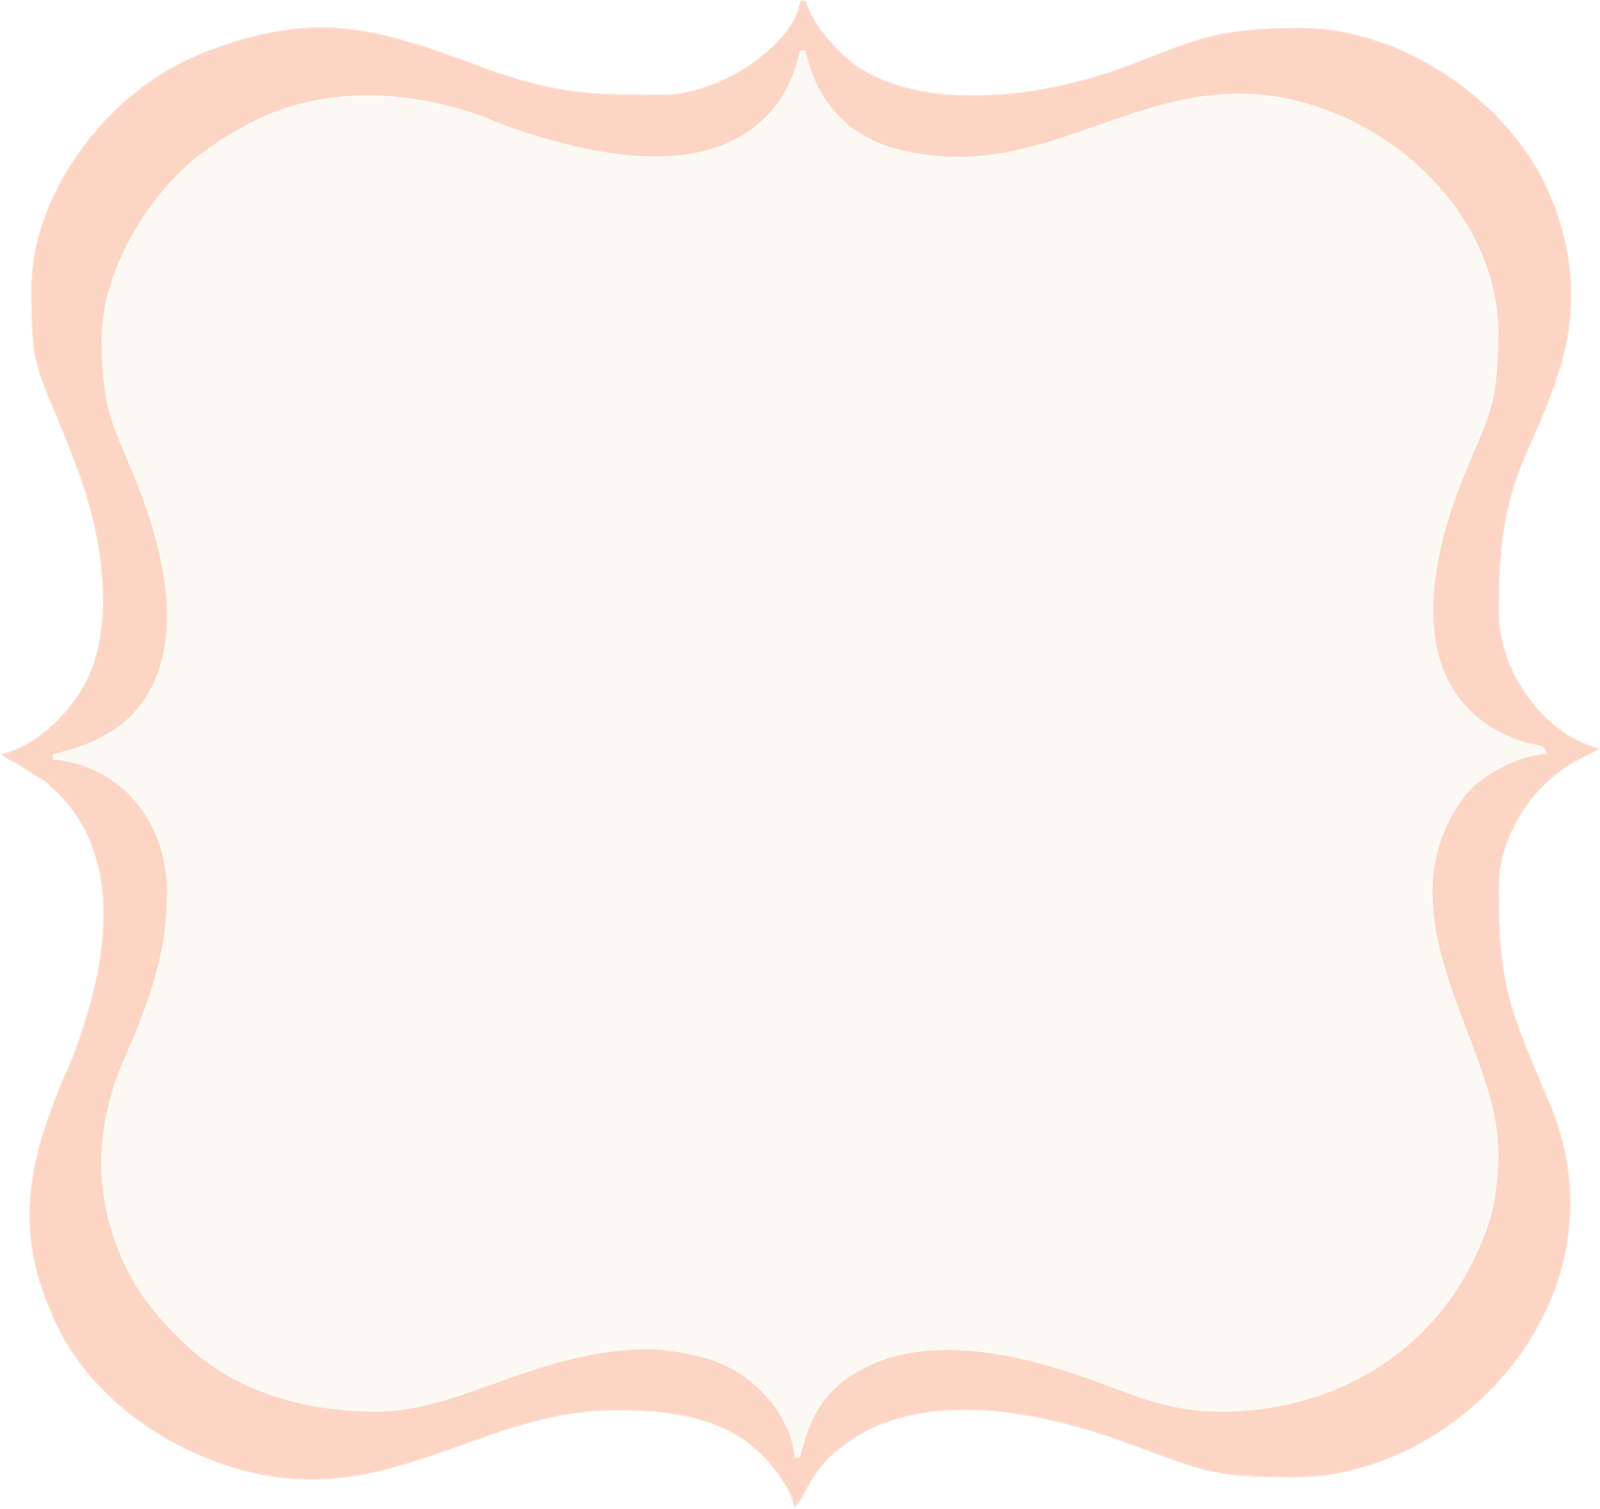 royalty free download Frame png frames vetores. Chalkboard clipart brown.